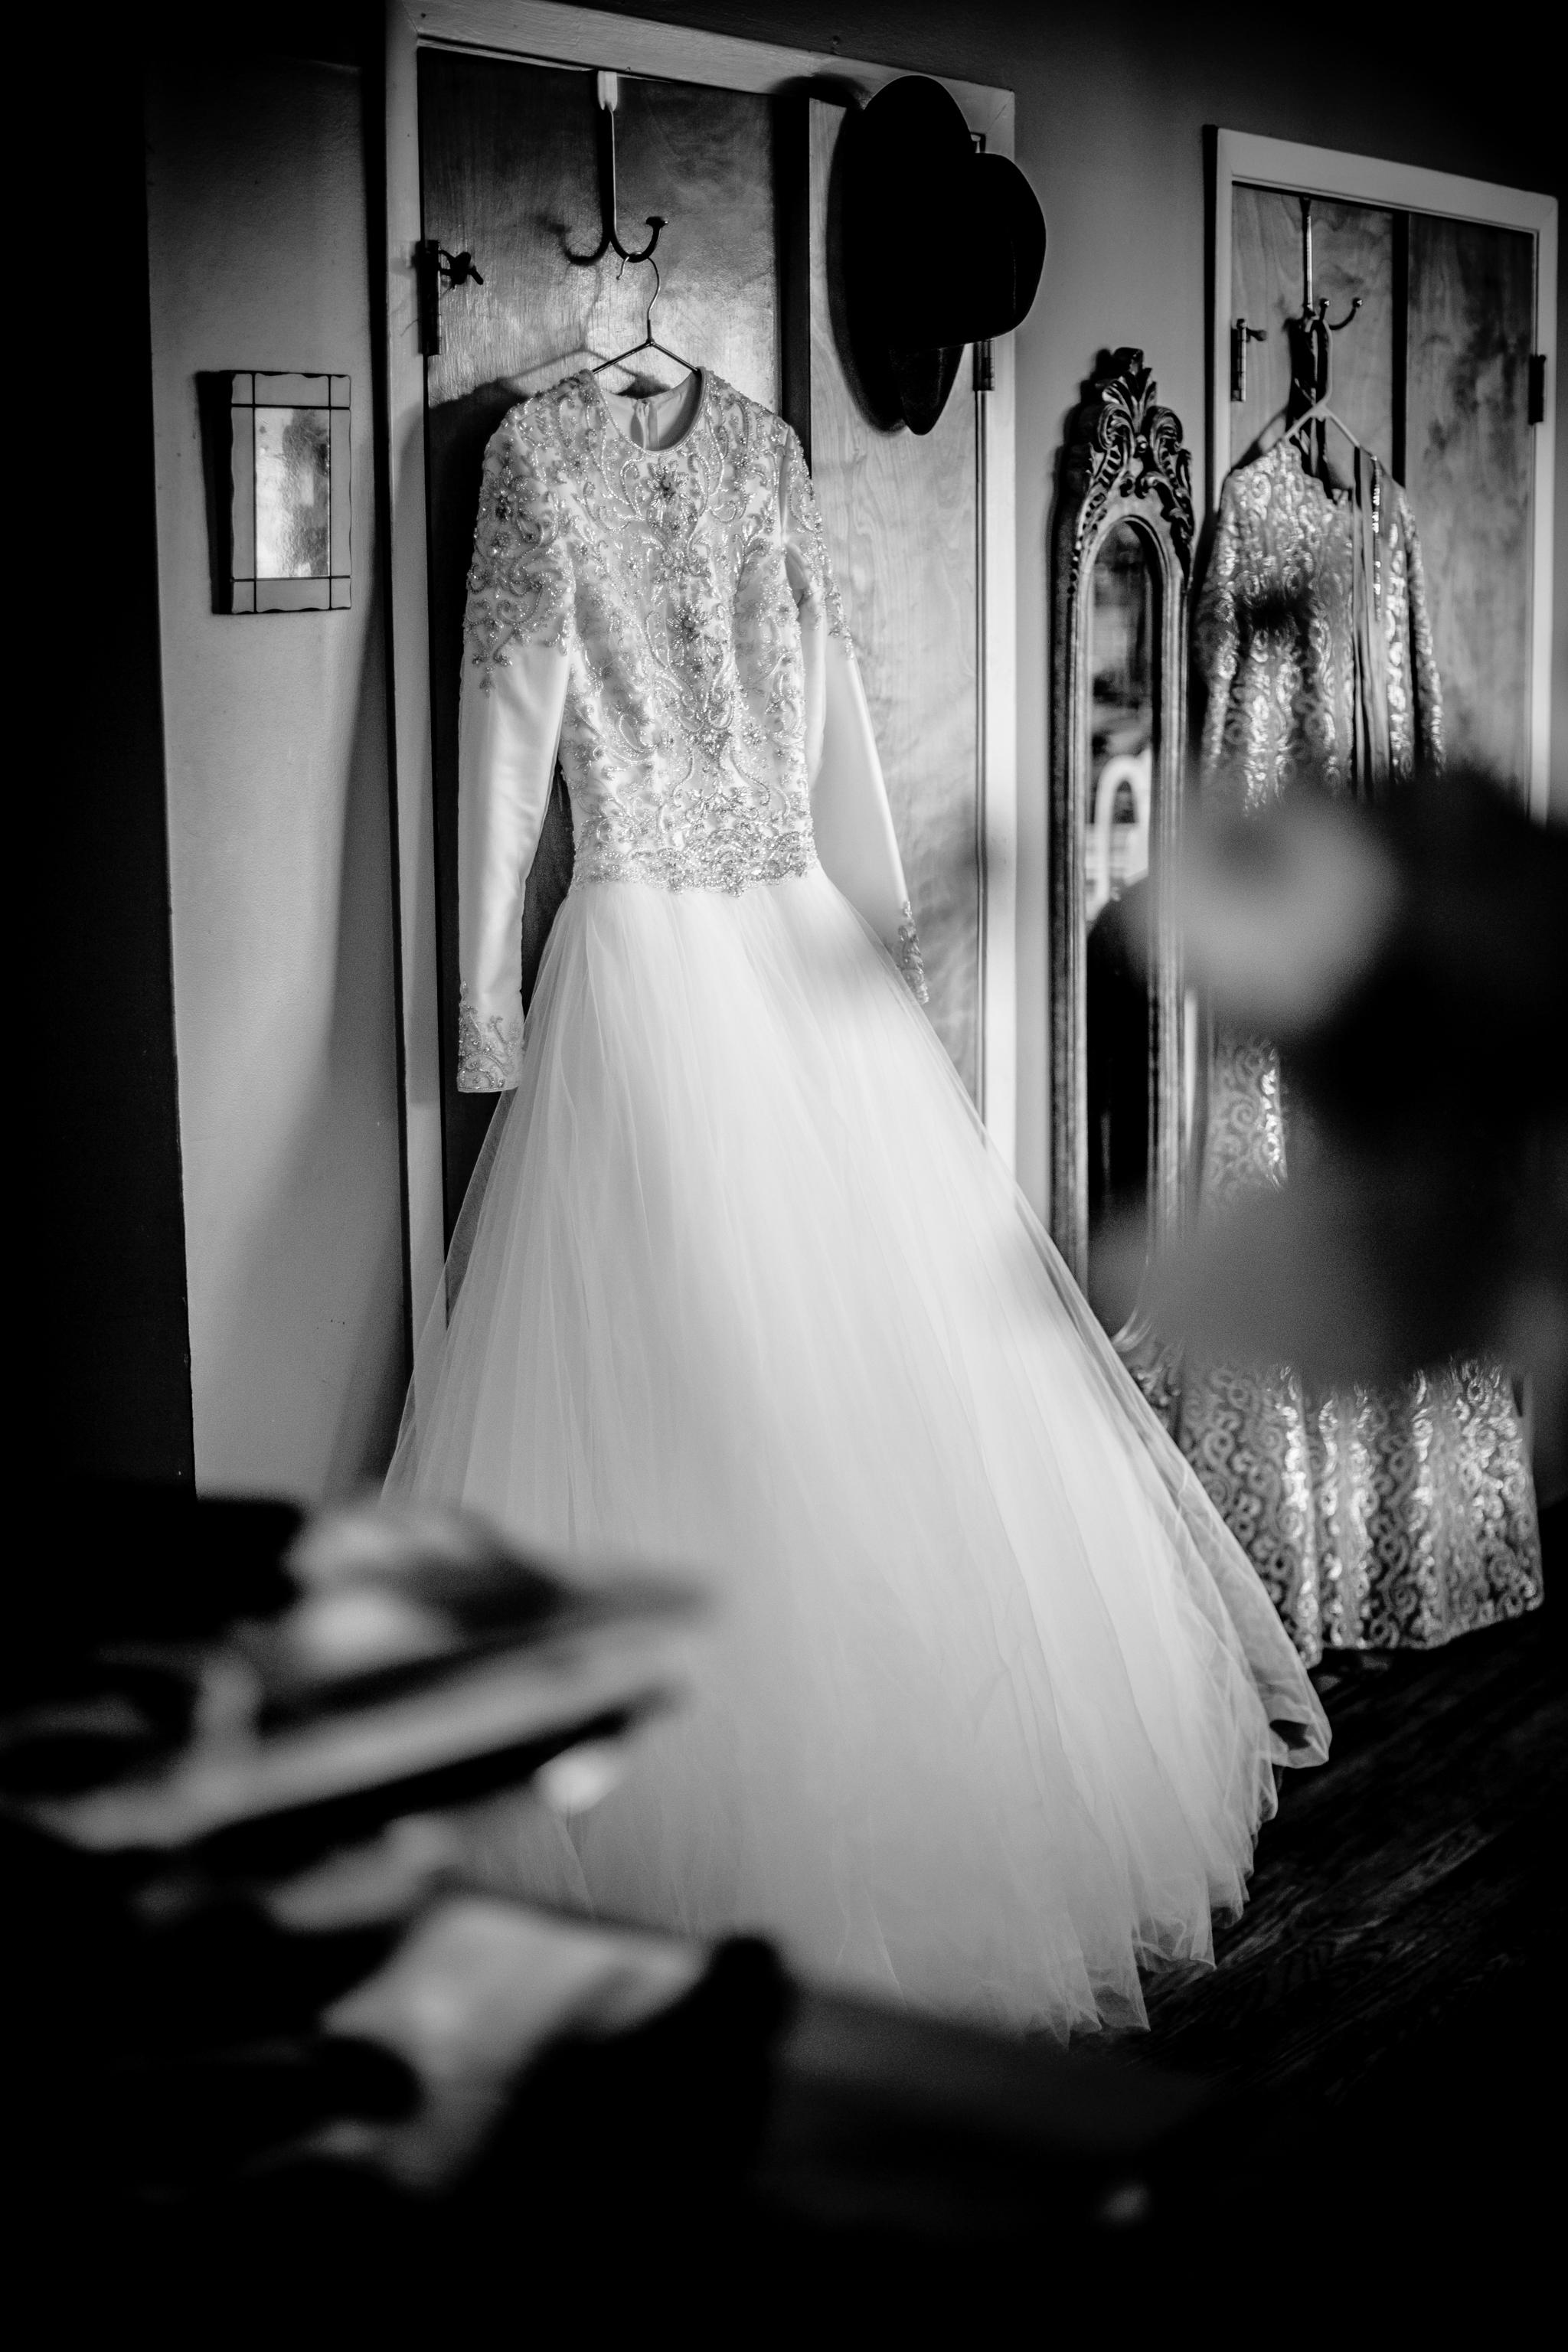 Wedding Iossi and Gitty Khafif  - Eliau Piha studio photography, new york, events, people 770 brooklyn -0037.jpg